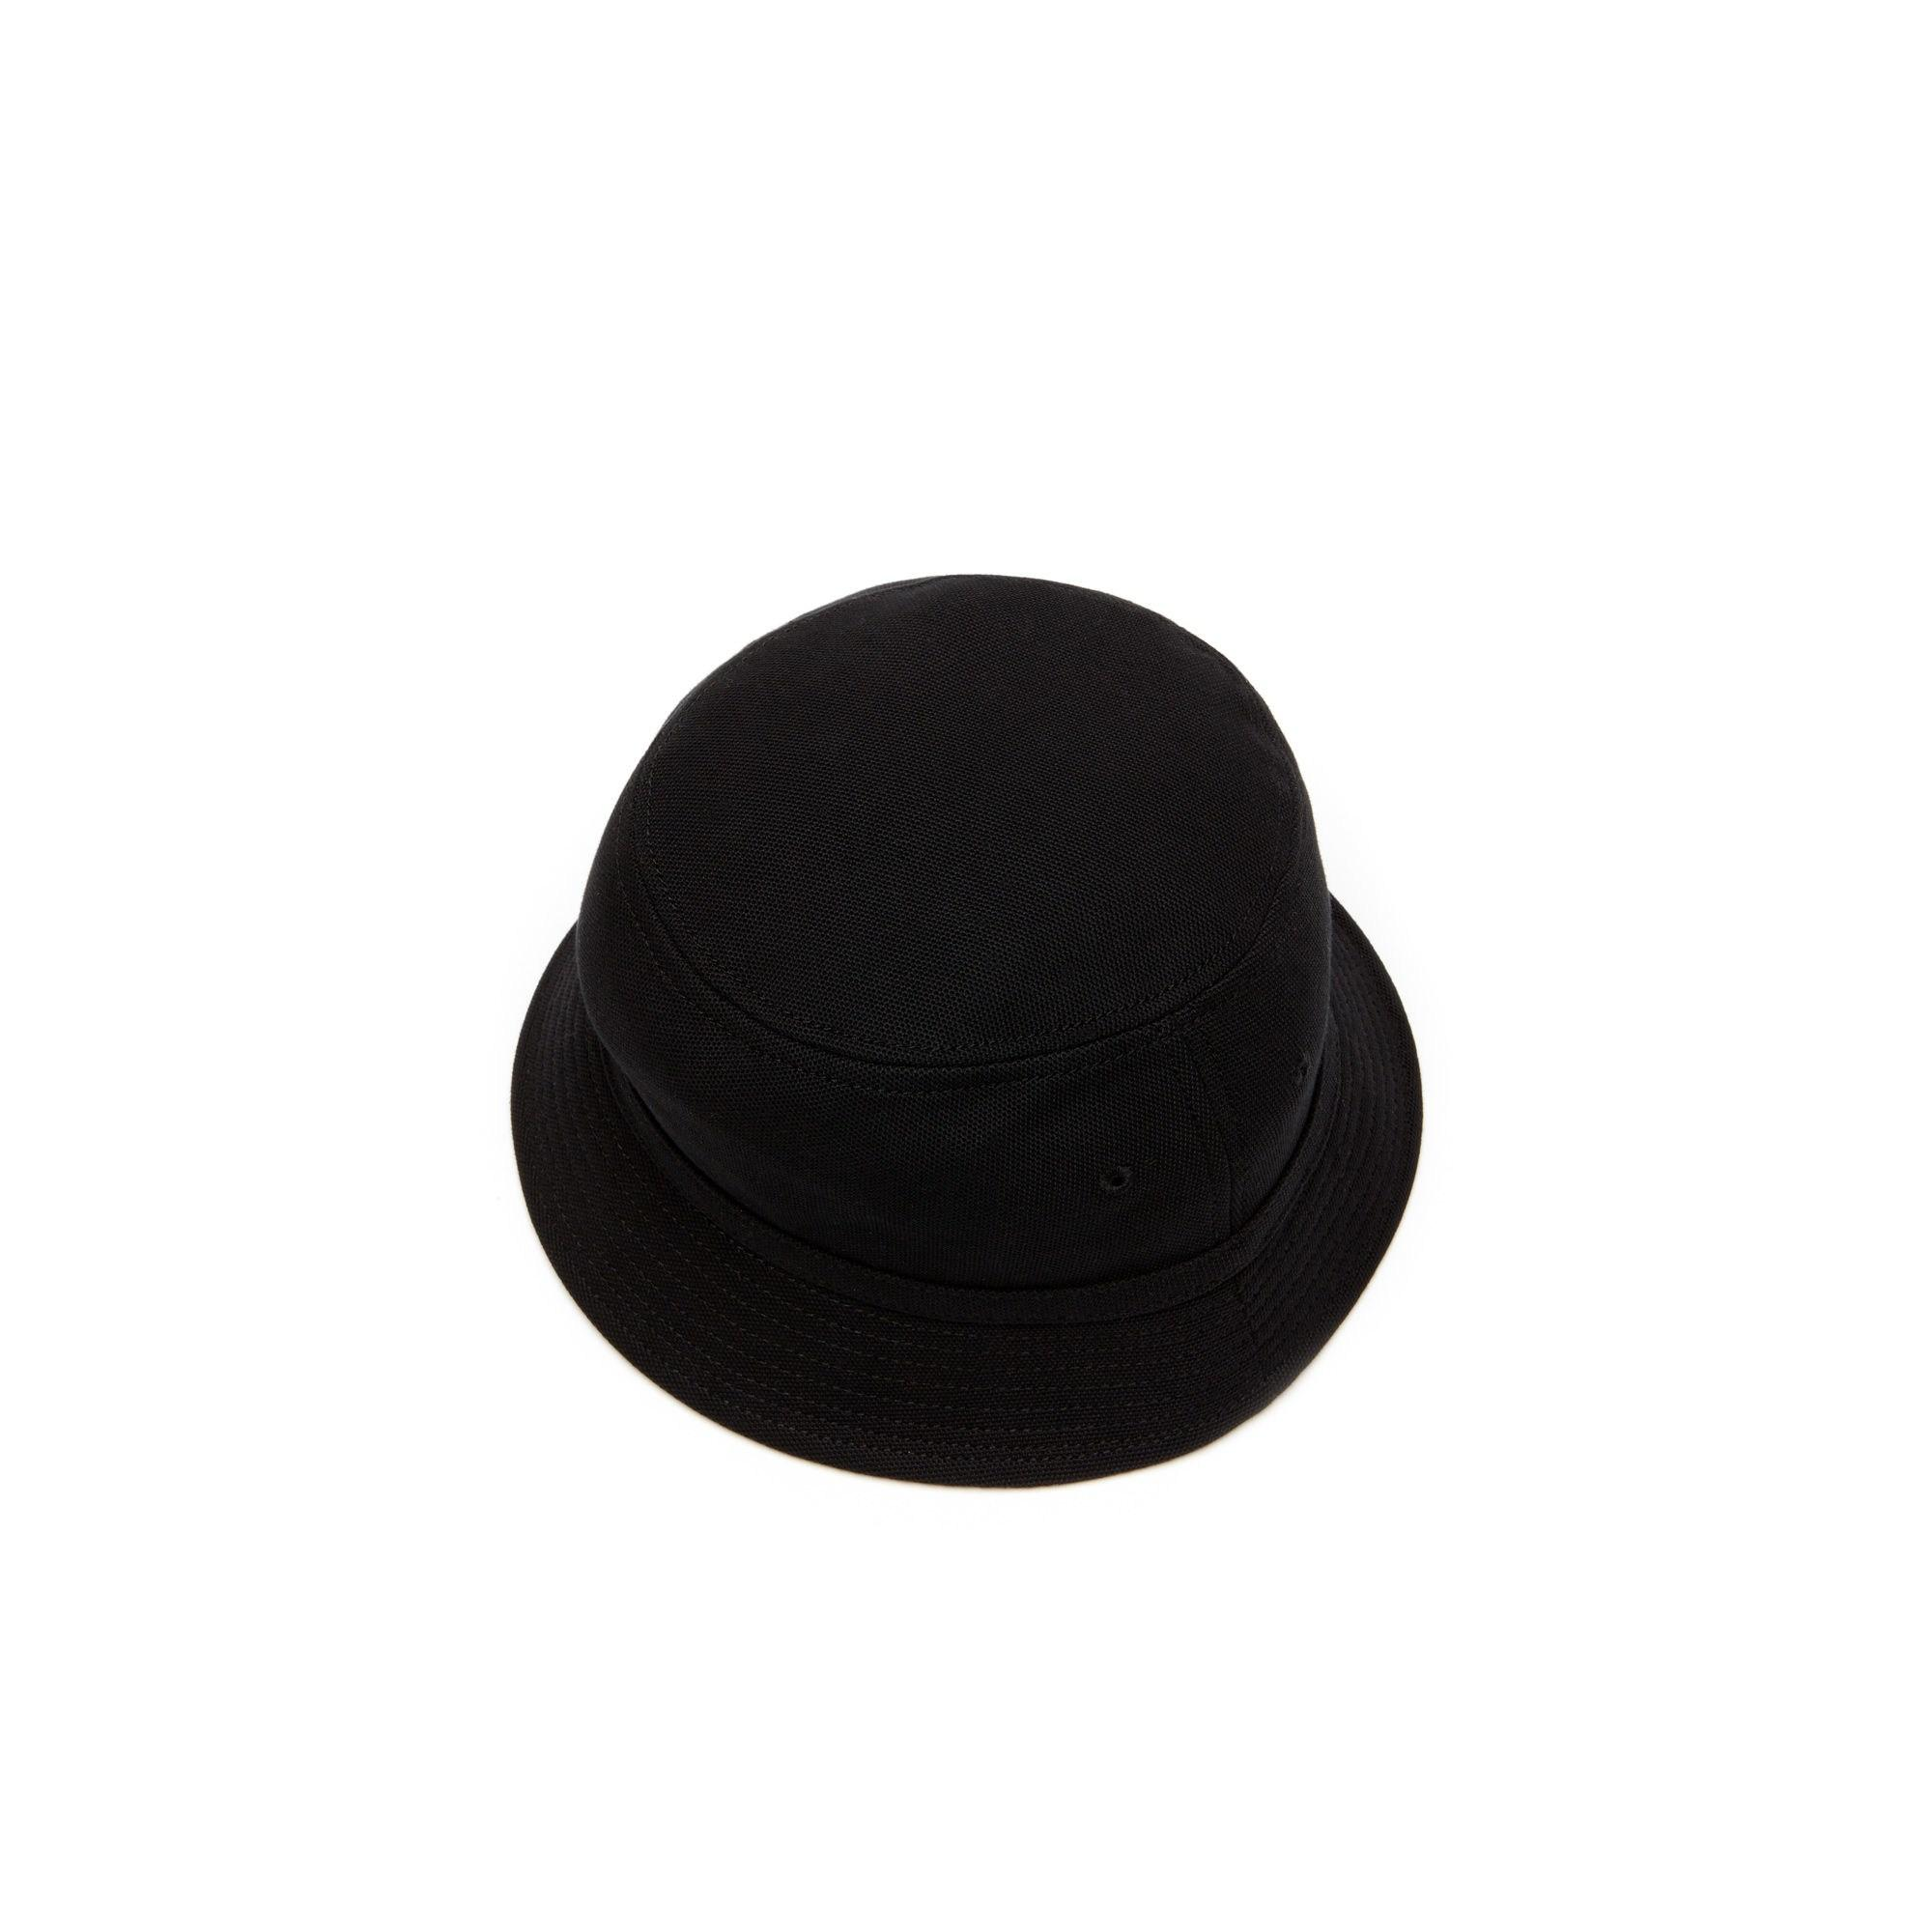 5aad5f82 Lacoste - Black Cotton Piqué Bucket Hat for Men - Lyst. View fullscreen